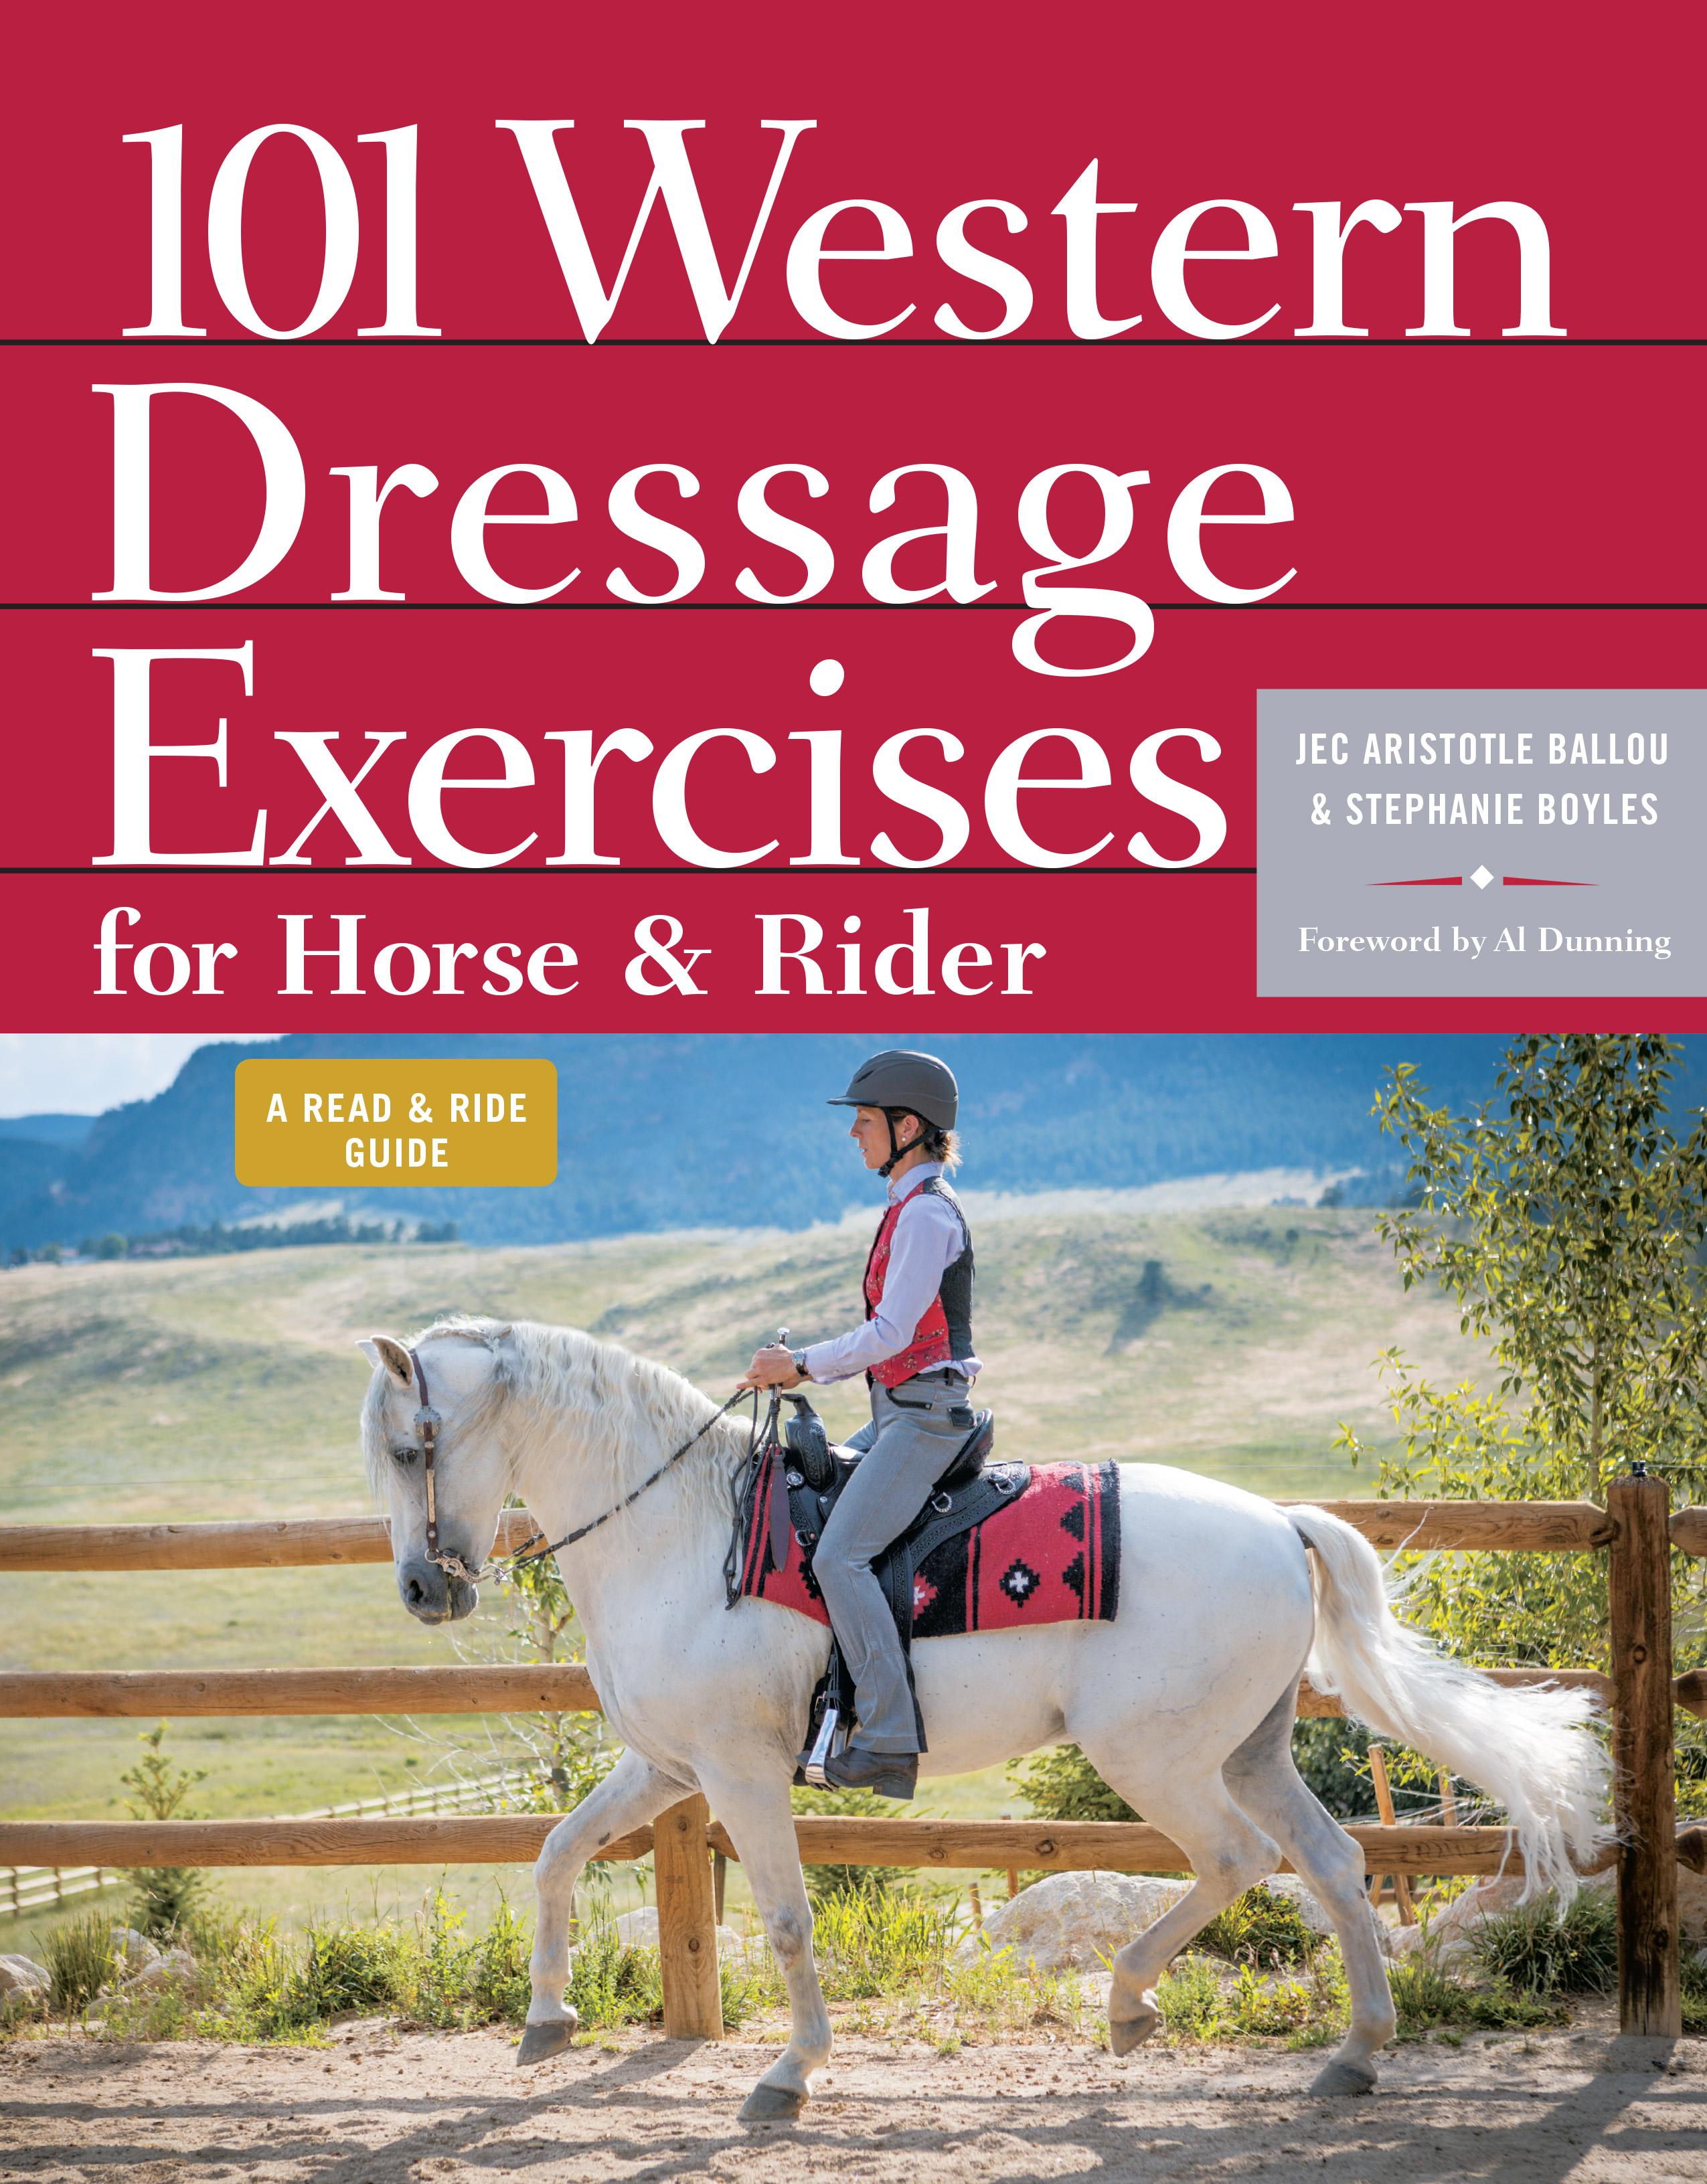 101 Western Dressage Exercises for Horse & Rider  - Jec Aristotle Ballou